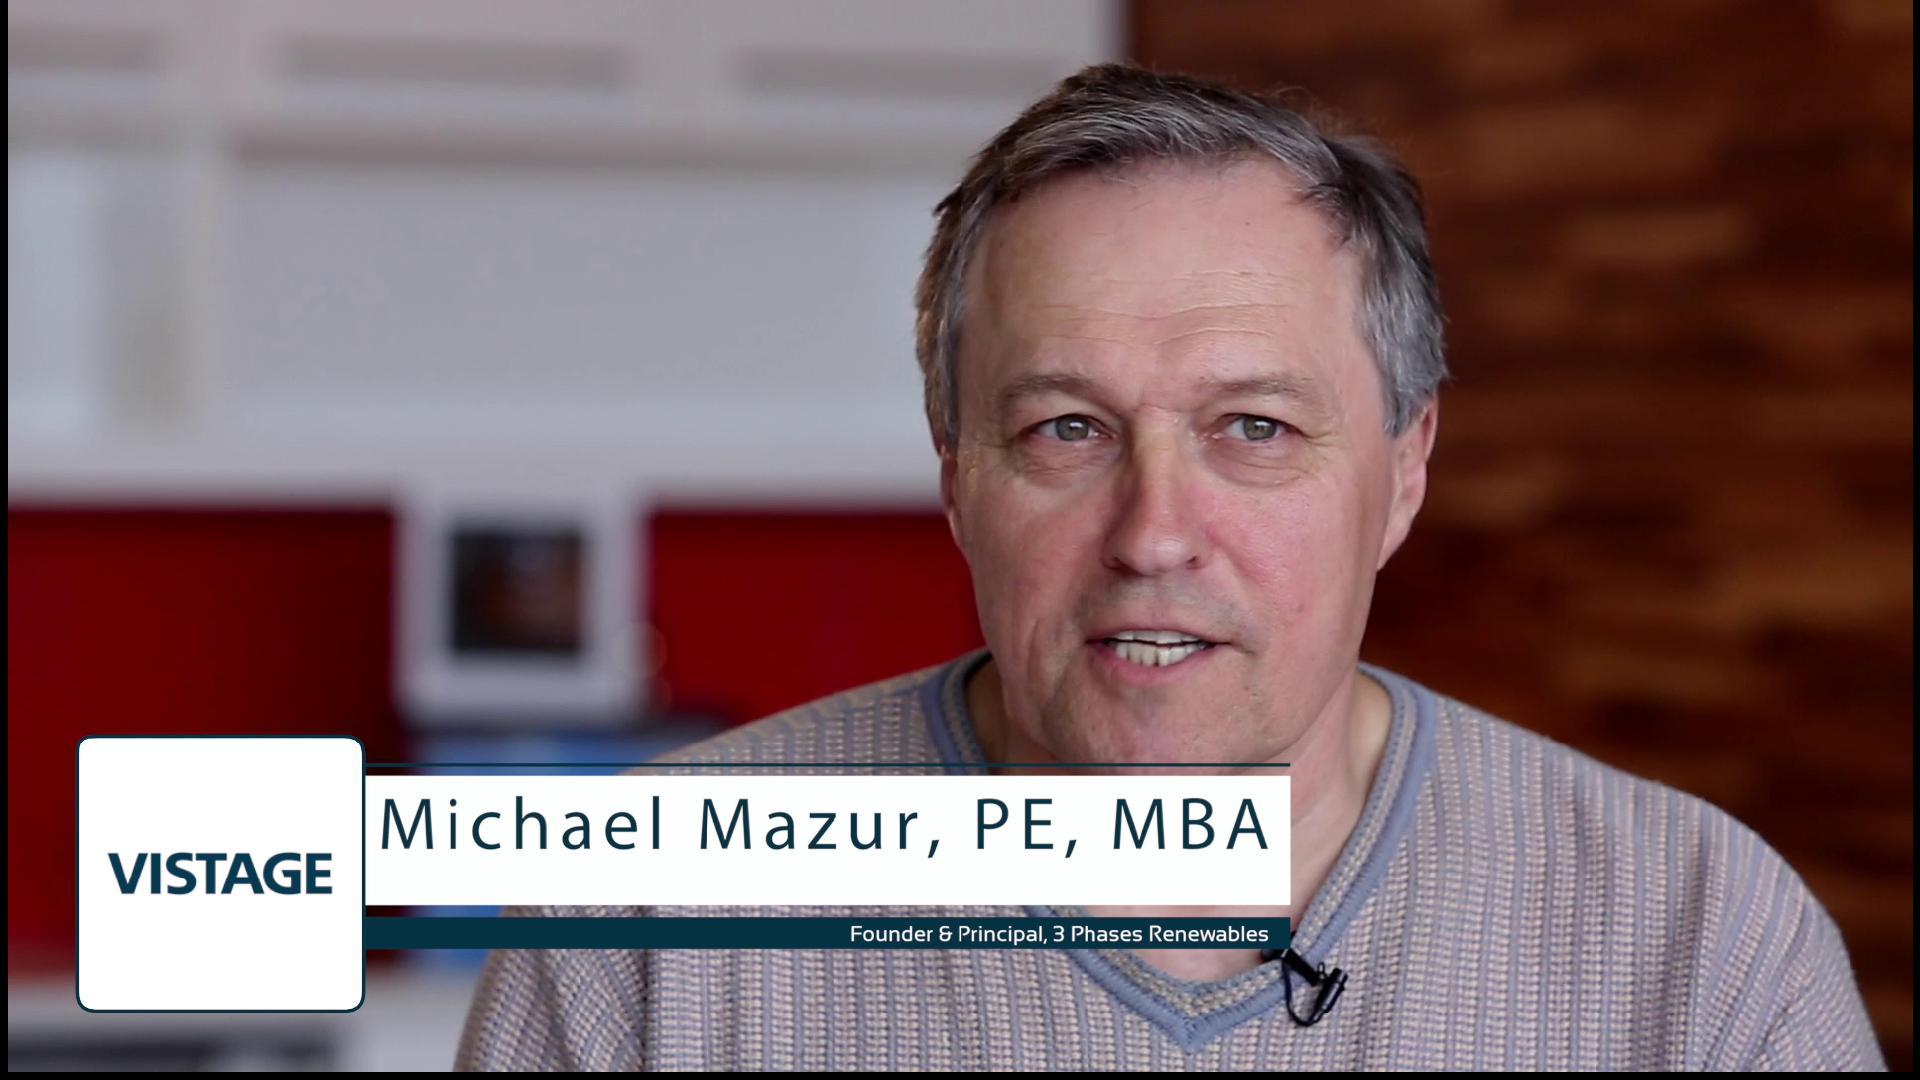 Mike Mazur